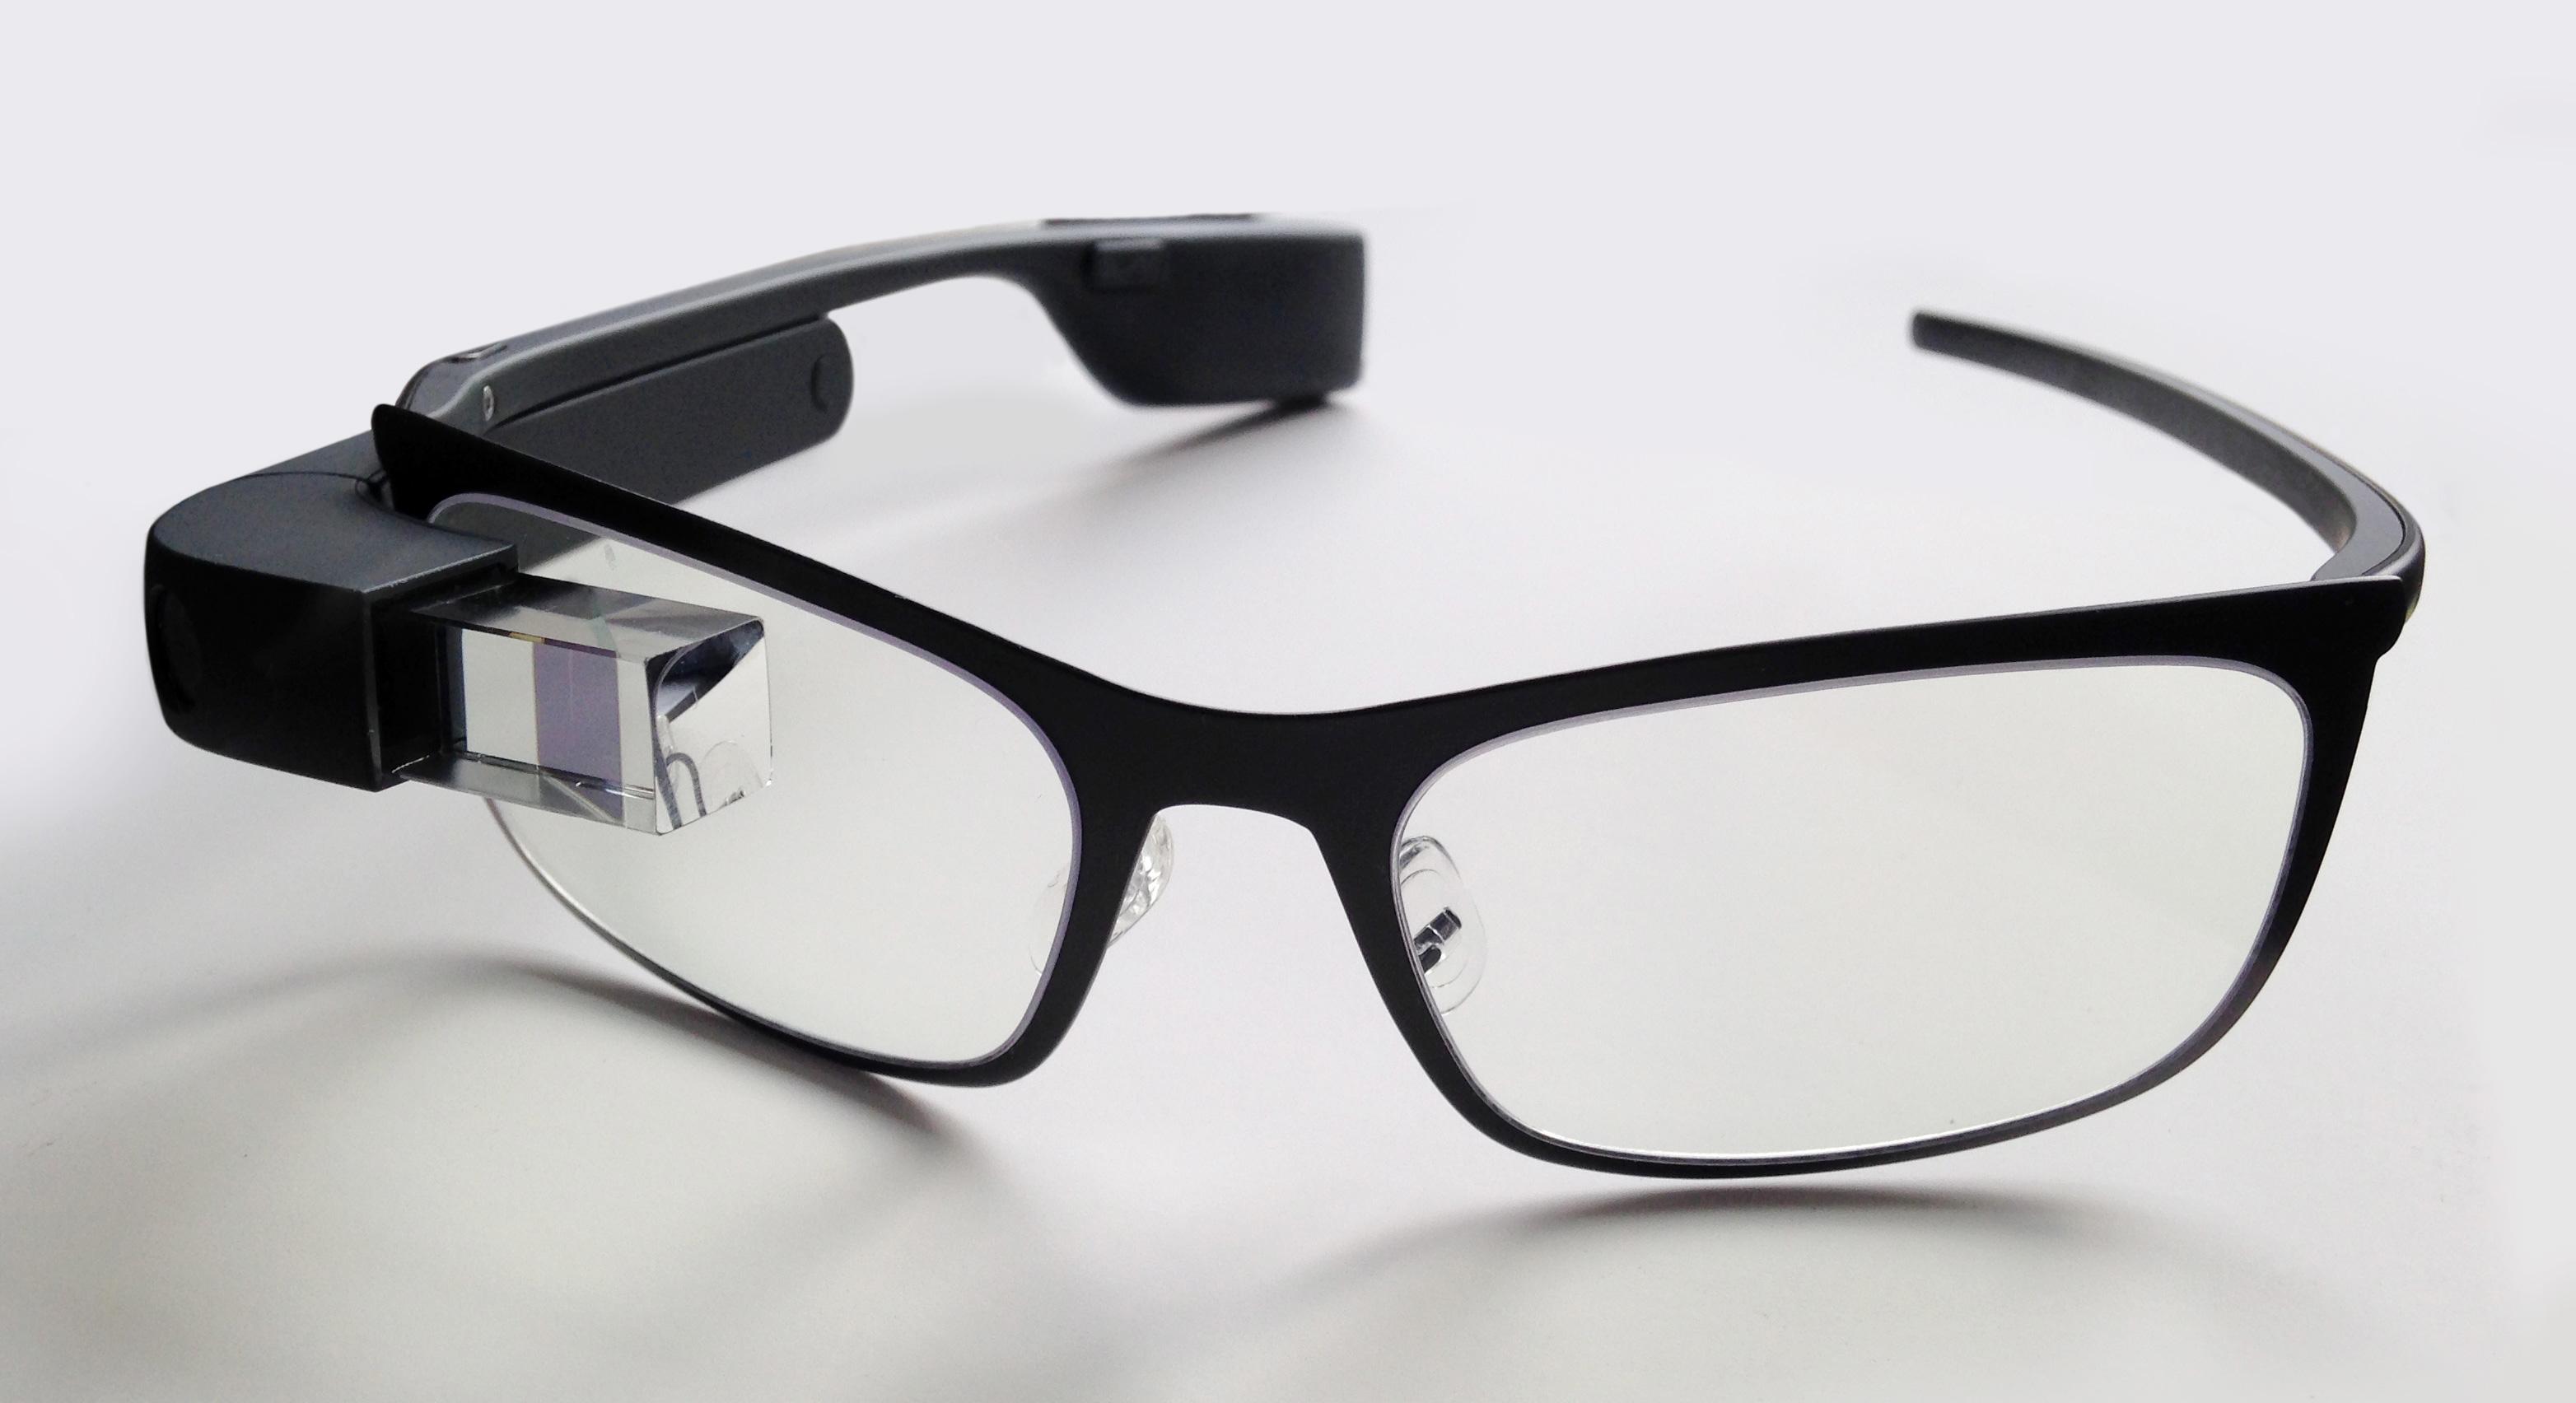 Image result for google glass images